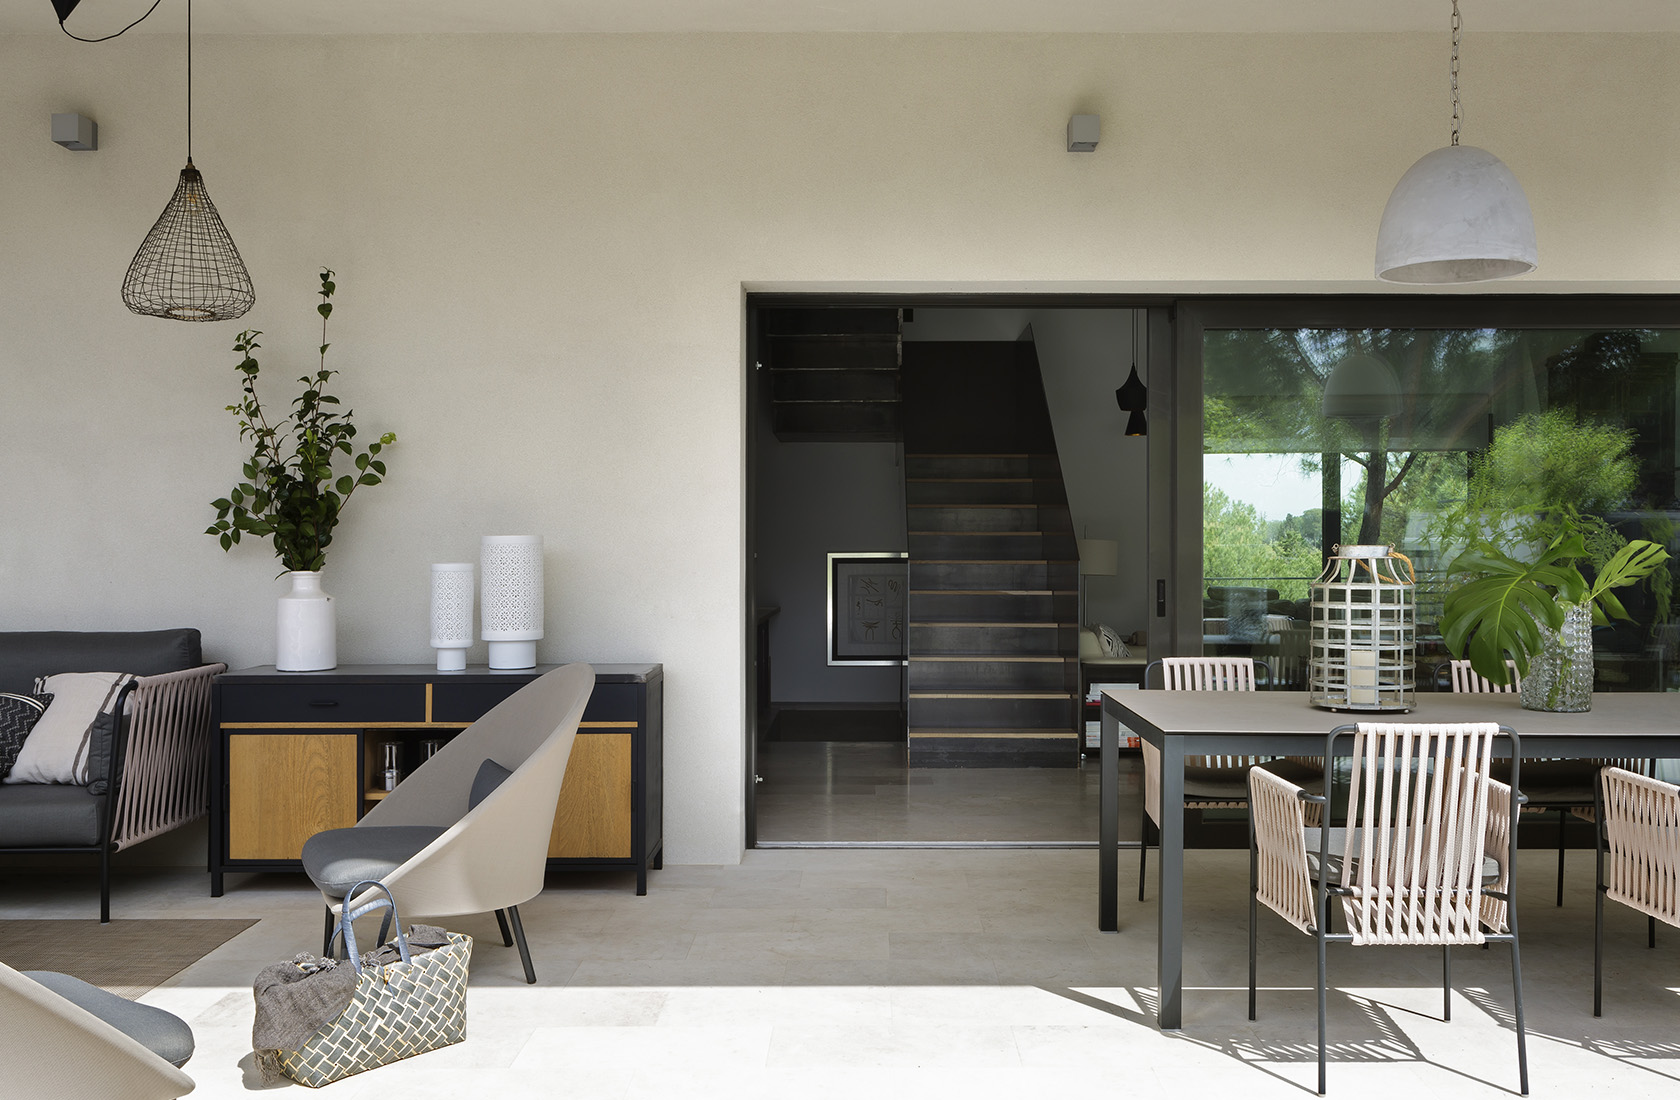 Porche Casa XY, Arquitectura en madera